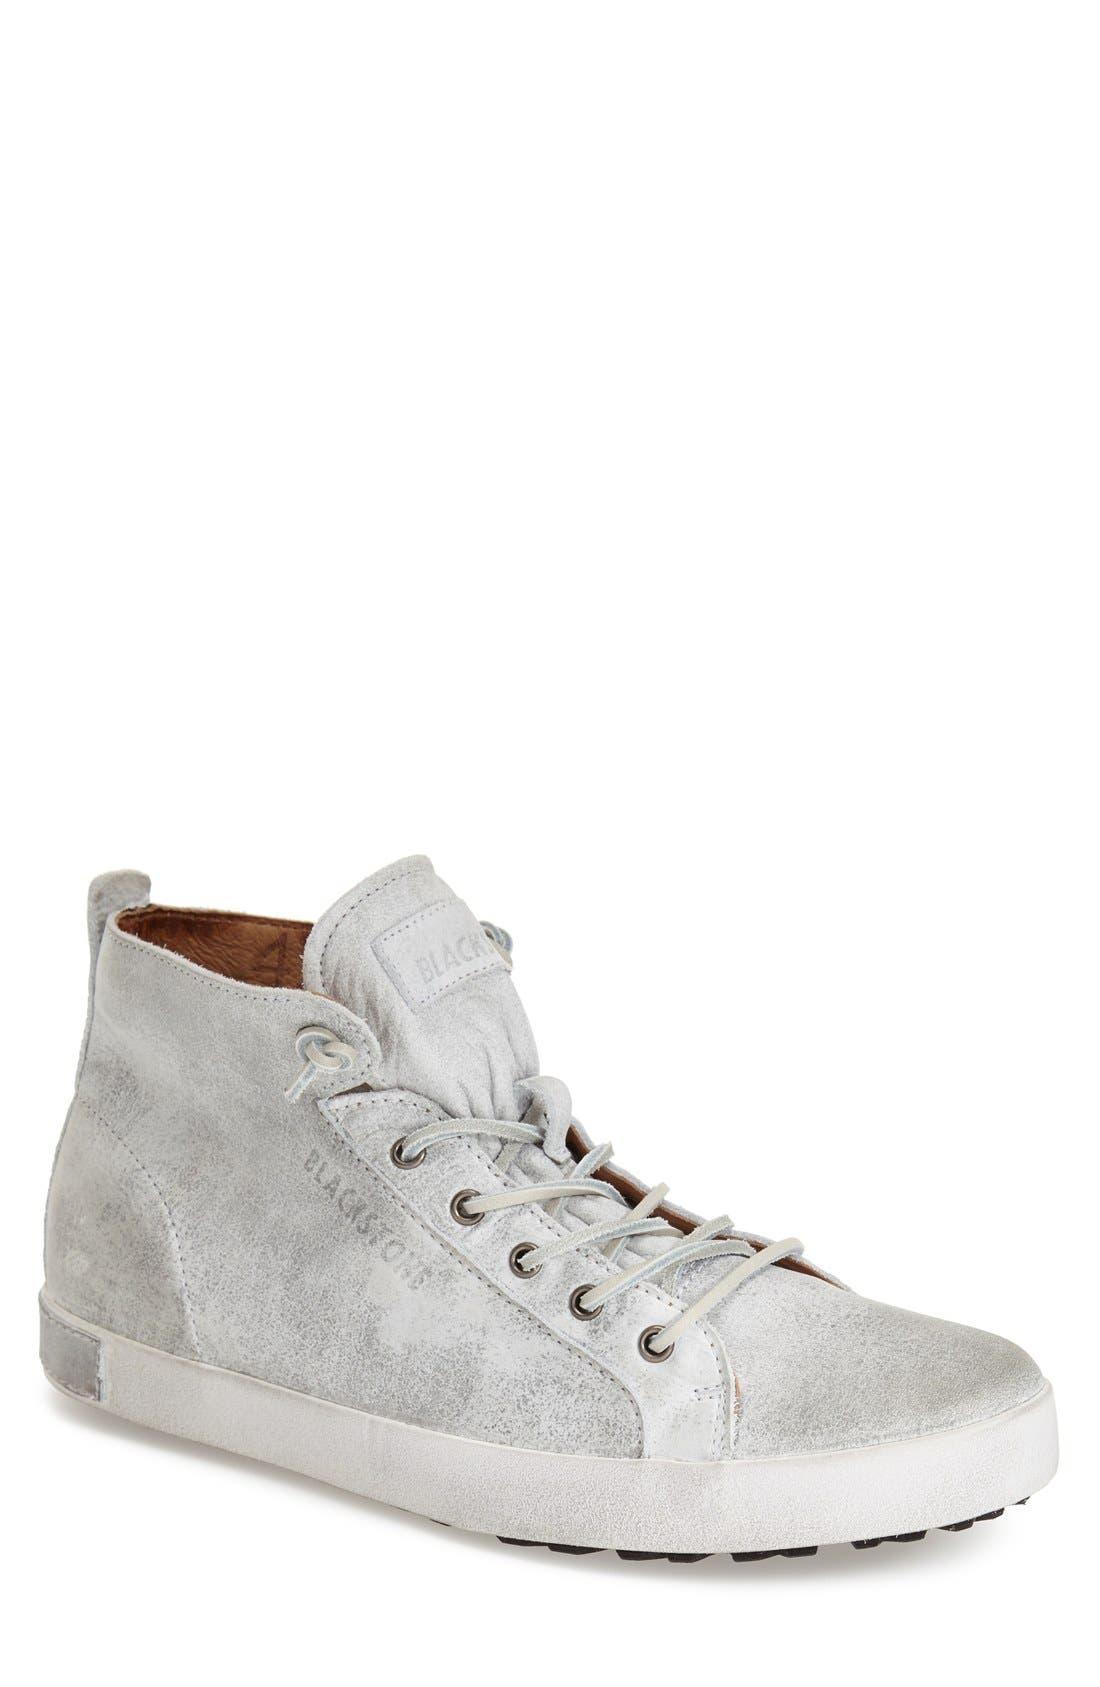 'JM 02' High Top Sneaker,                         Main,                         color,